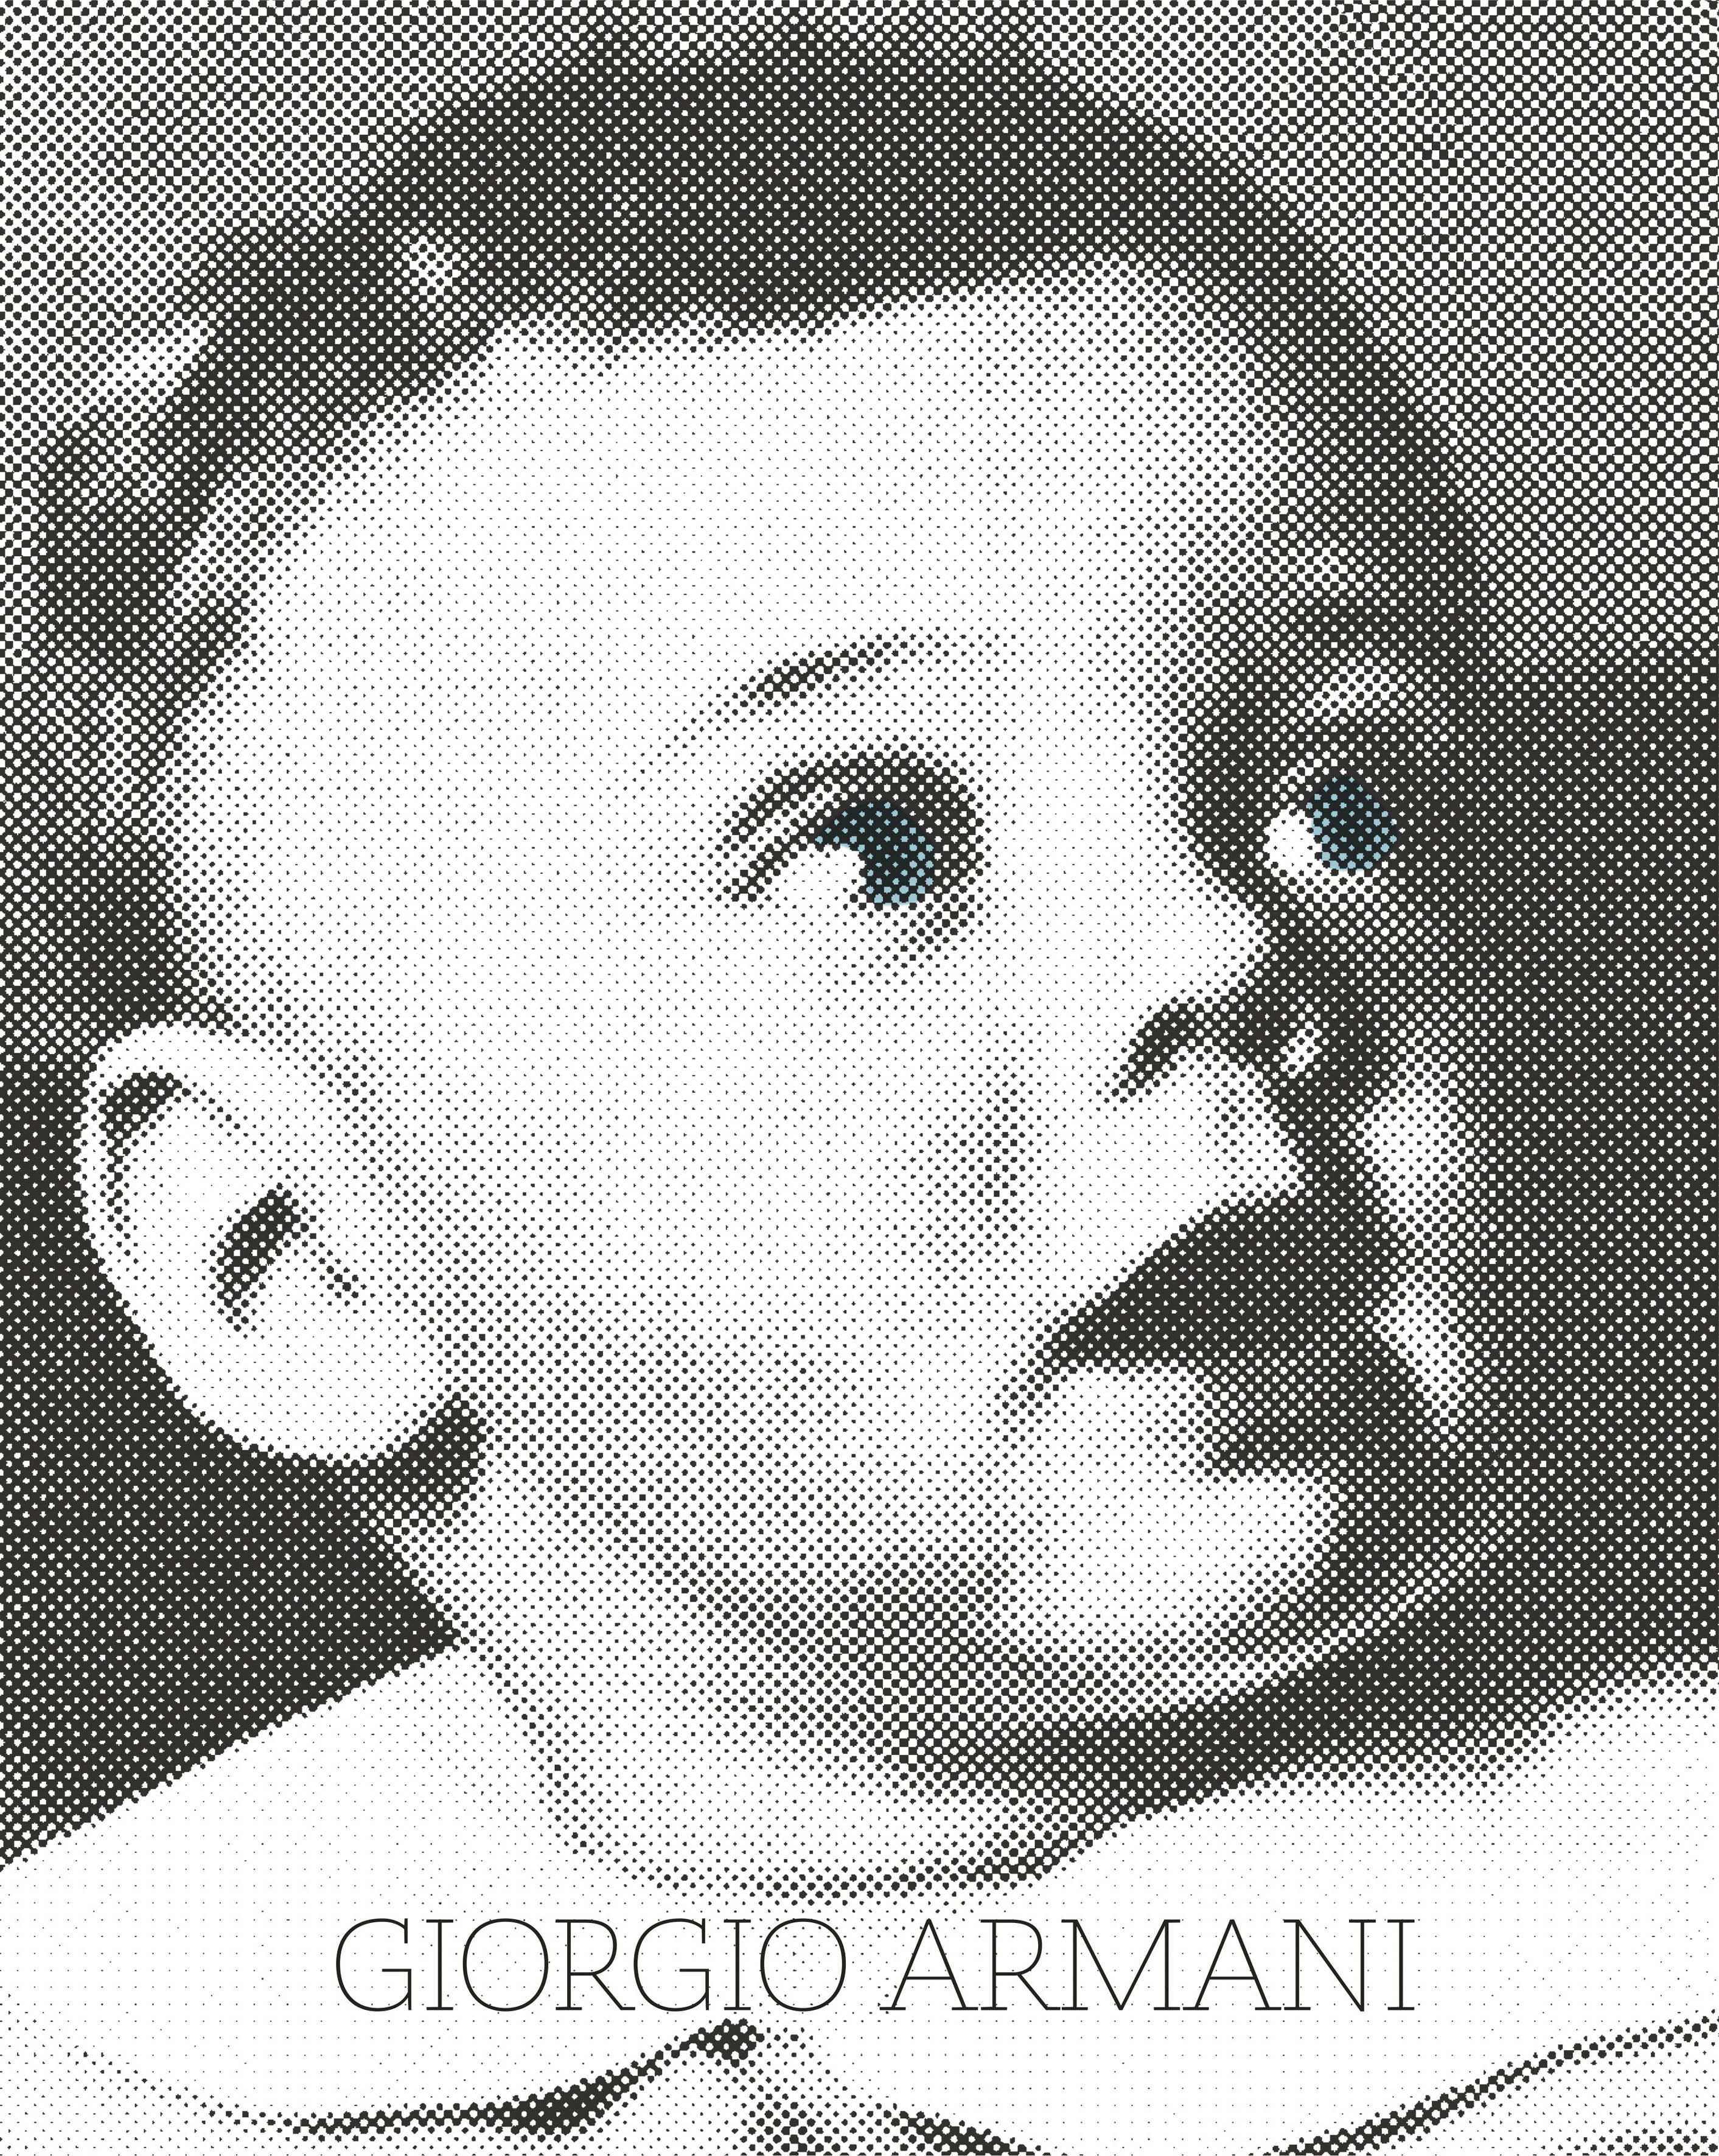 Details on the Giorgio Armani Autobiography